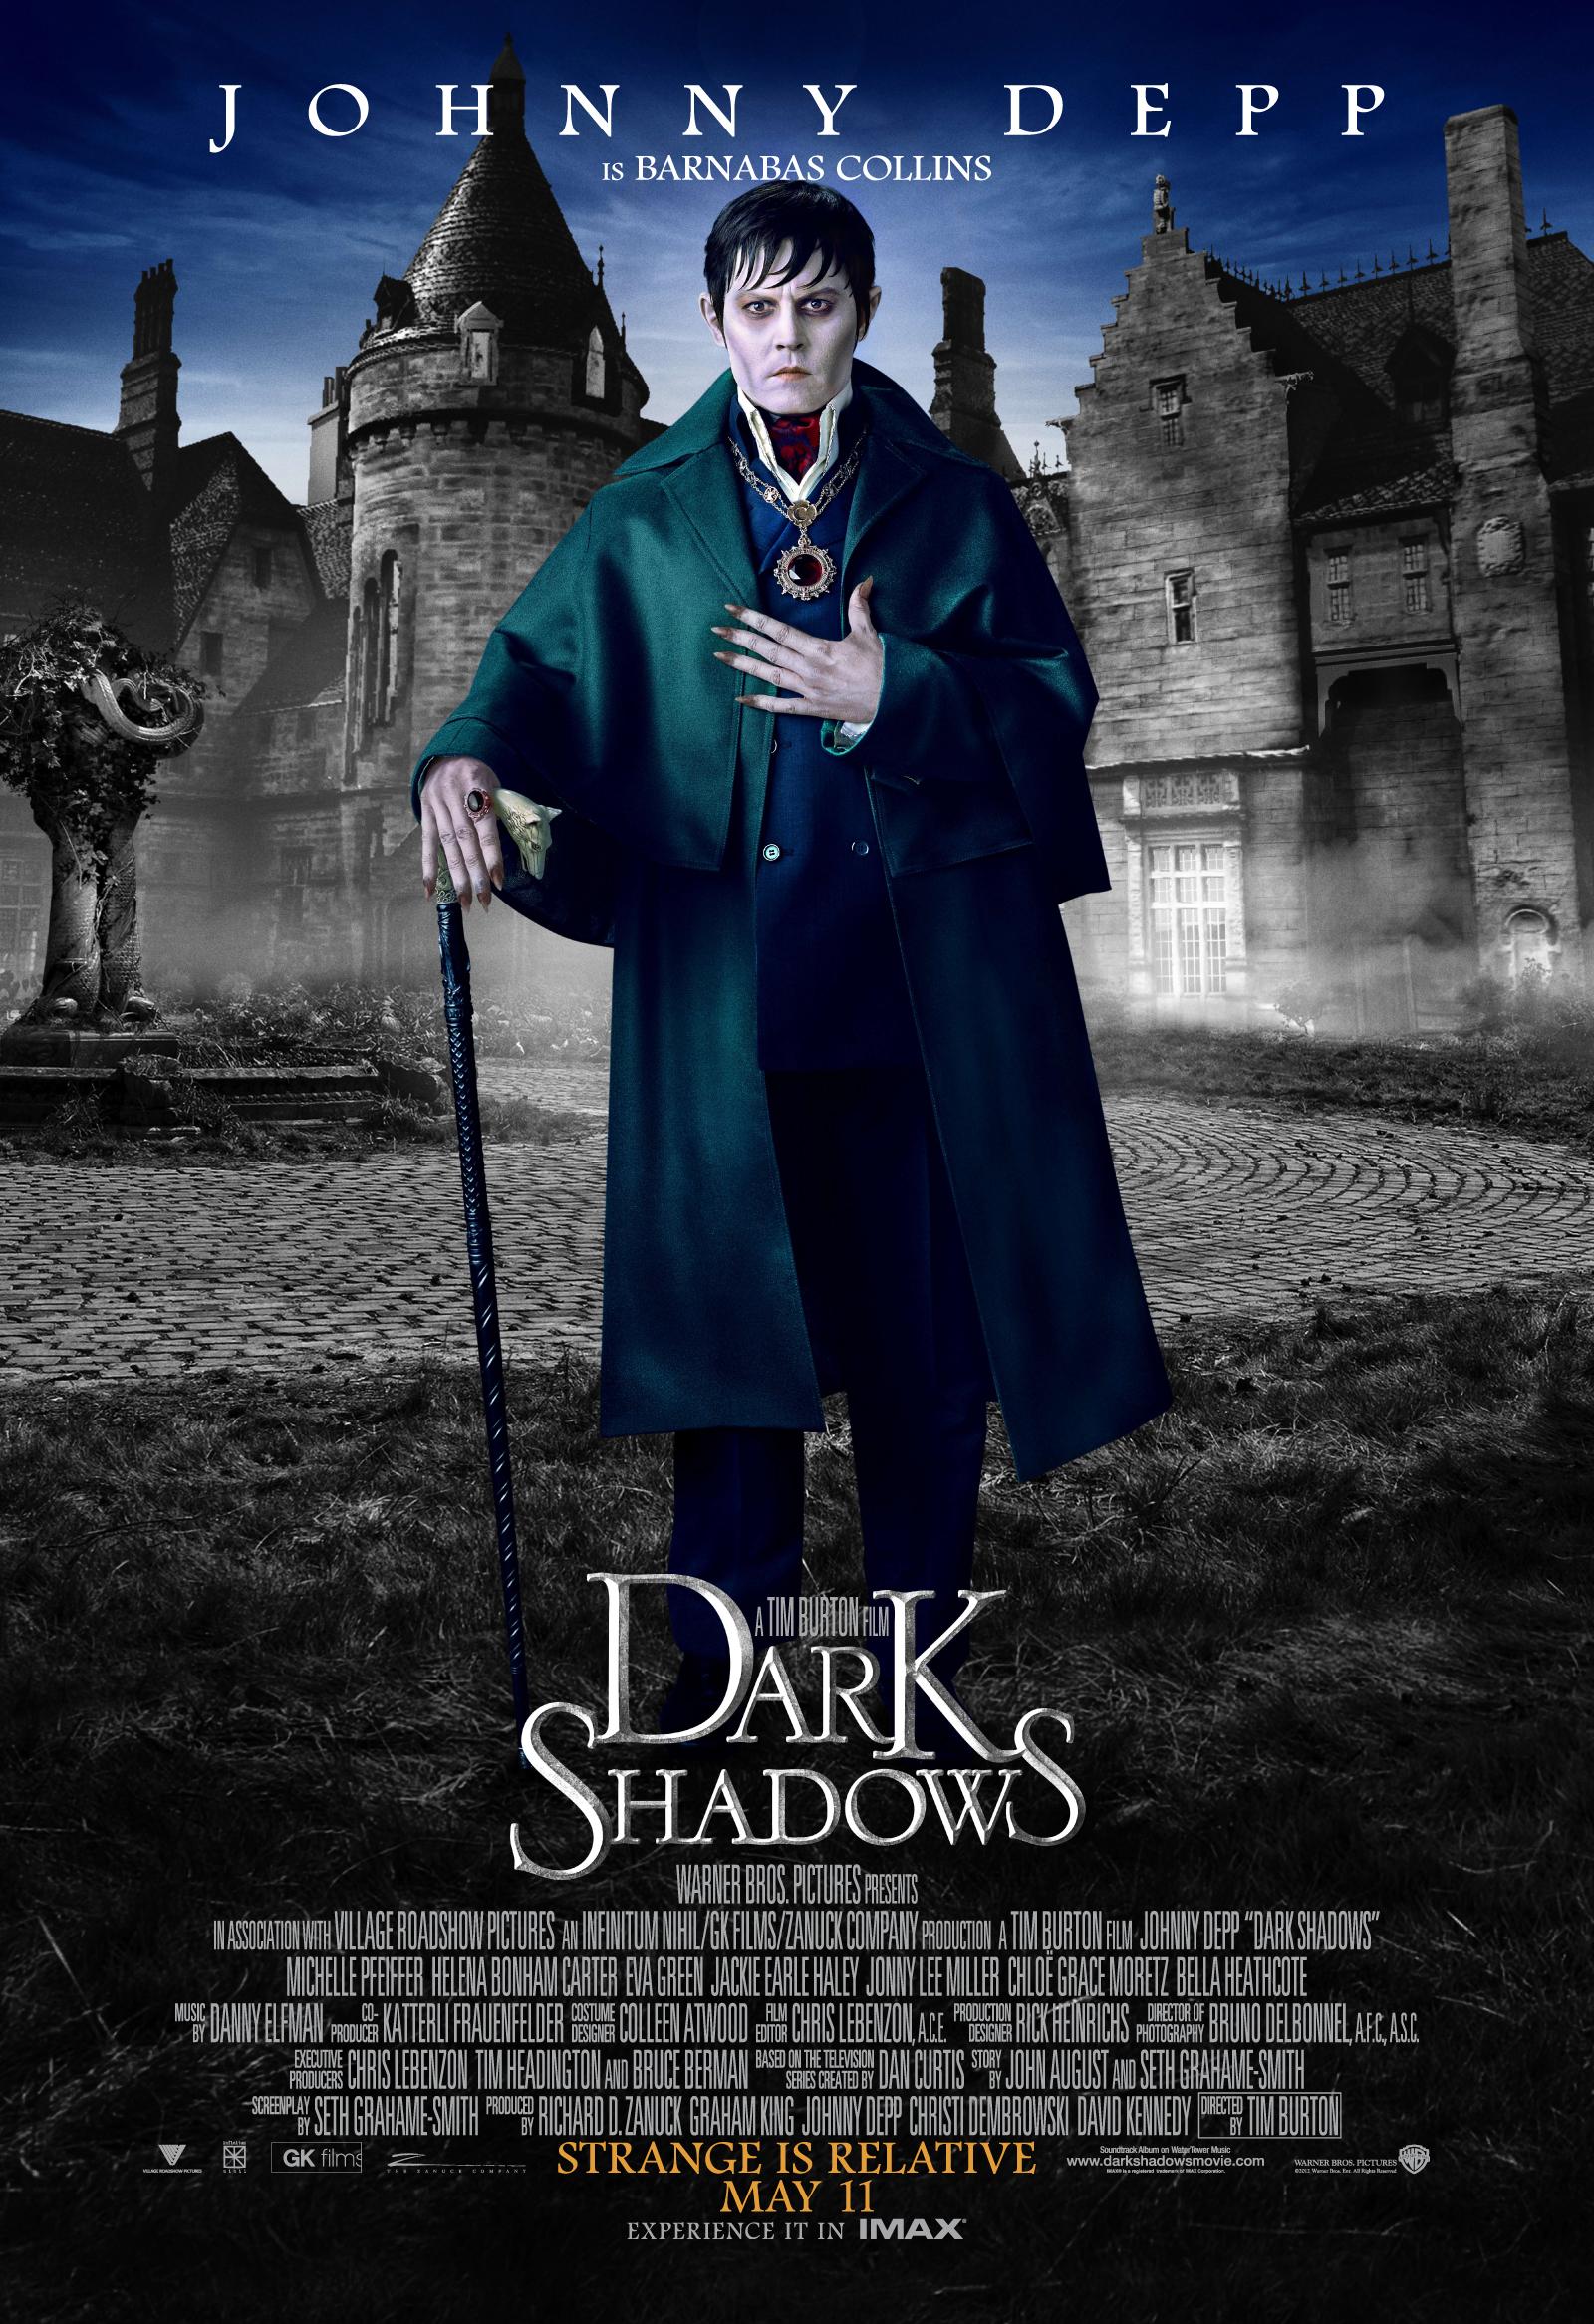 darkshadowsnewjd.jpg